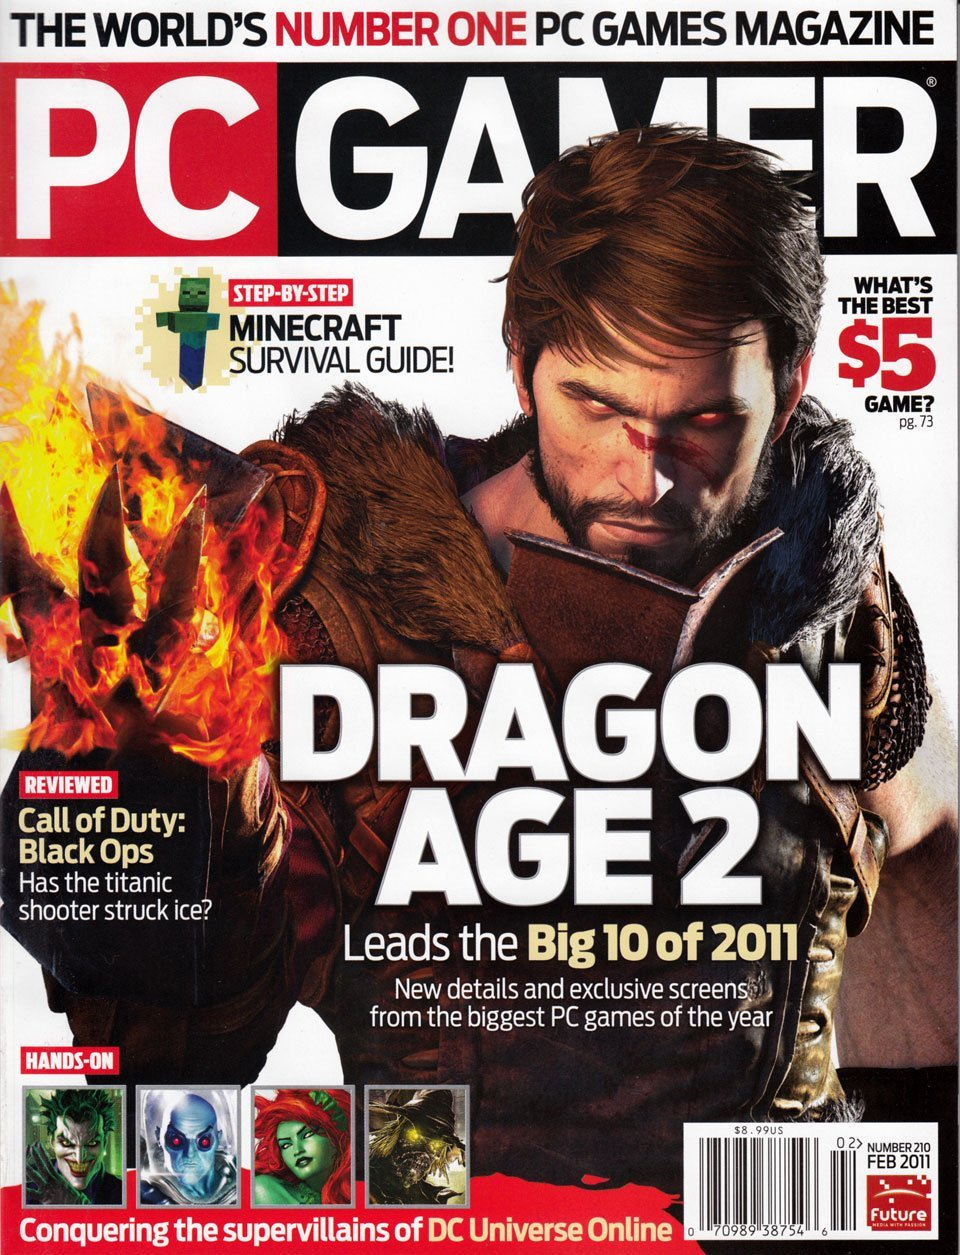 PC Gamer Issue 210 (February 2011)